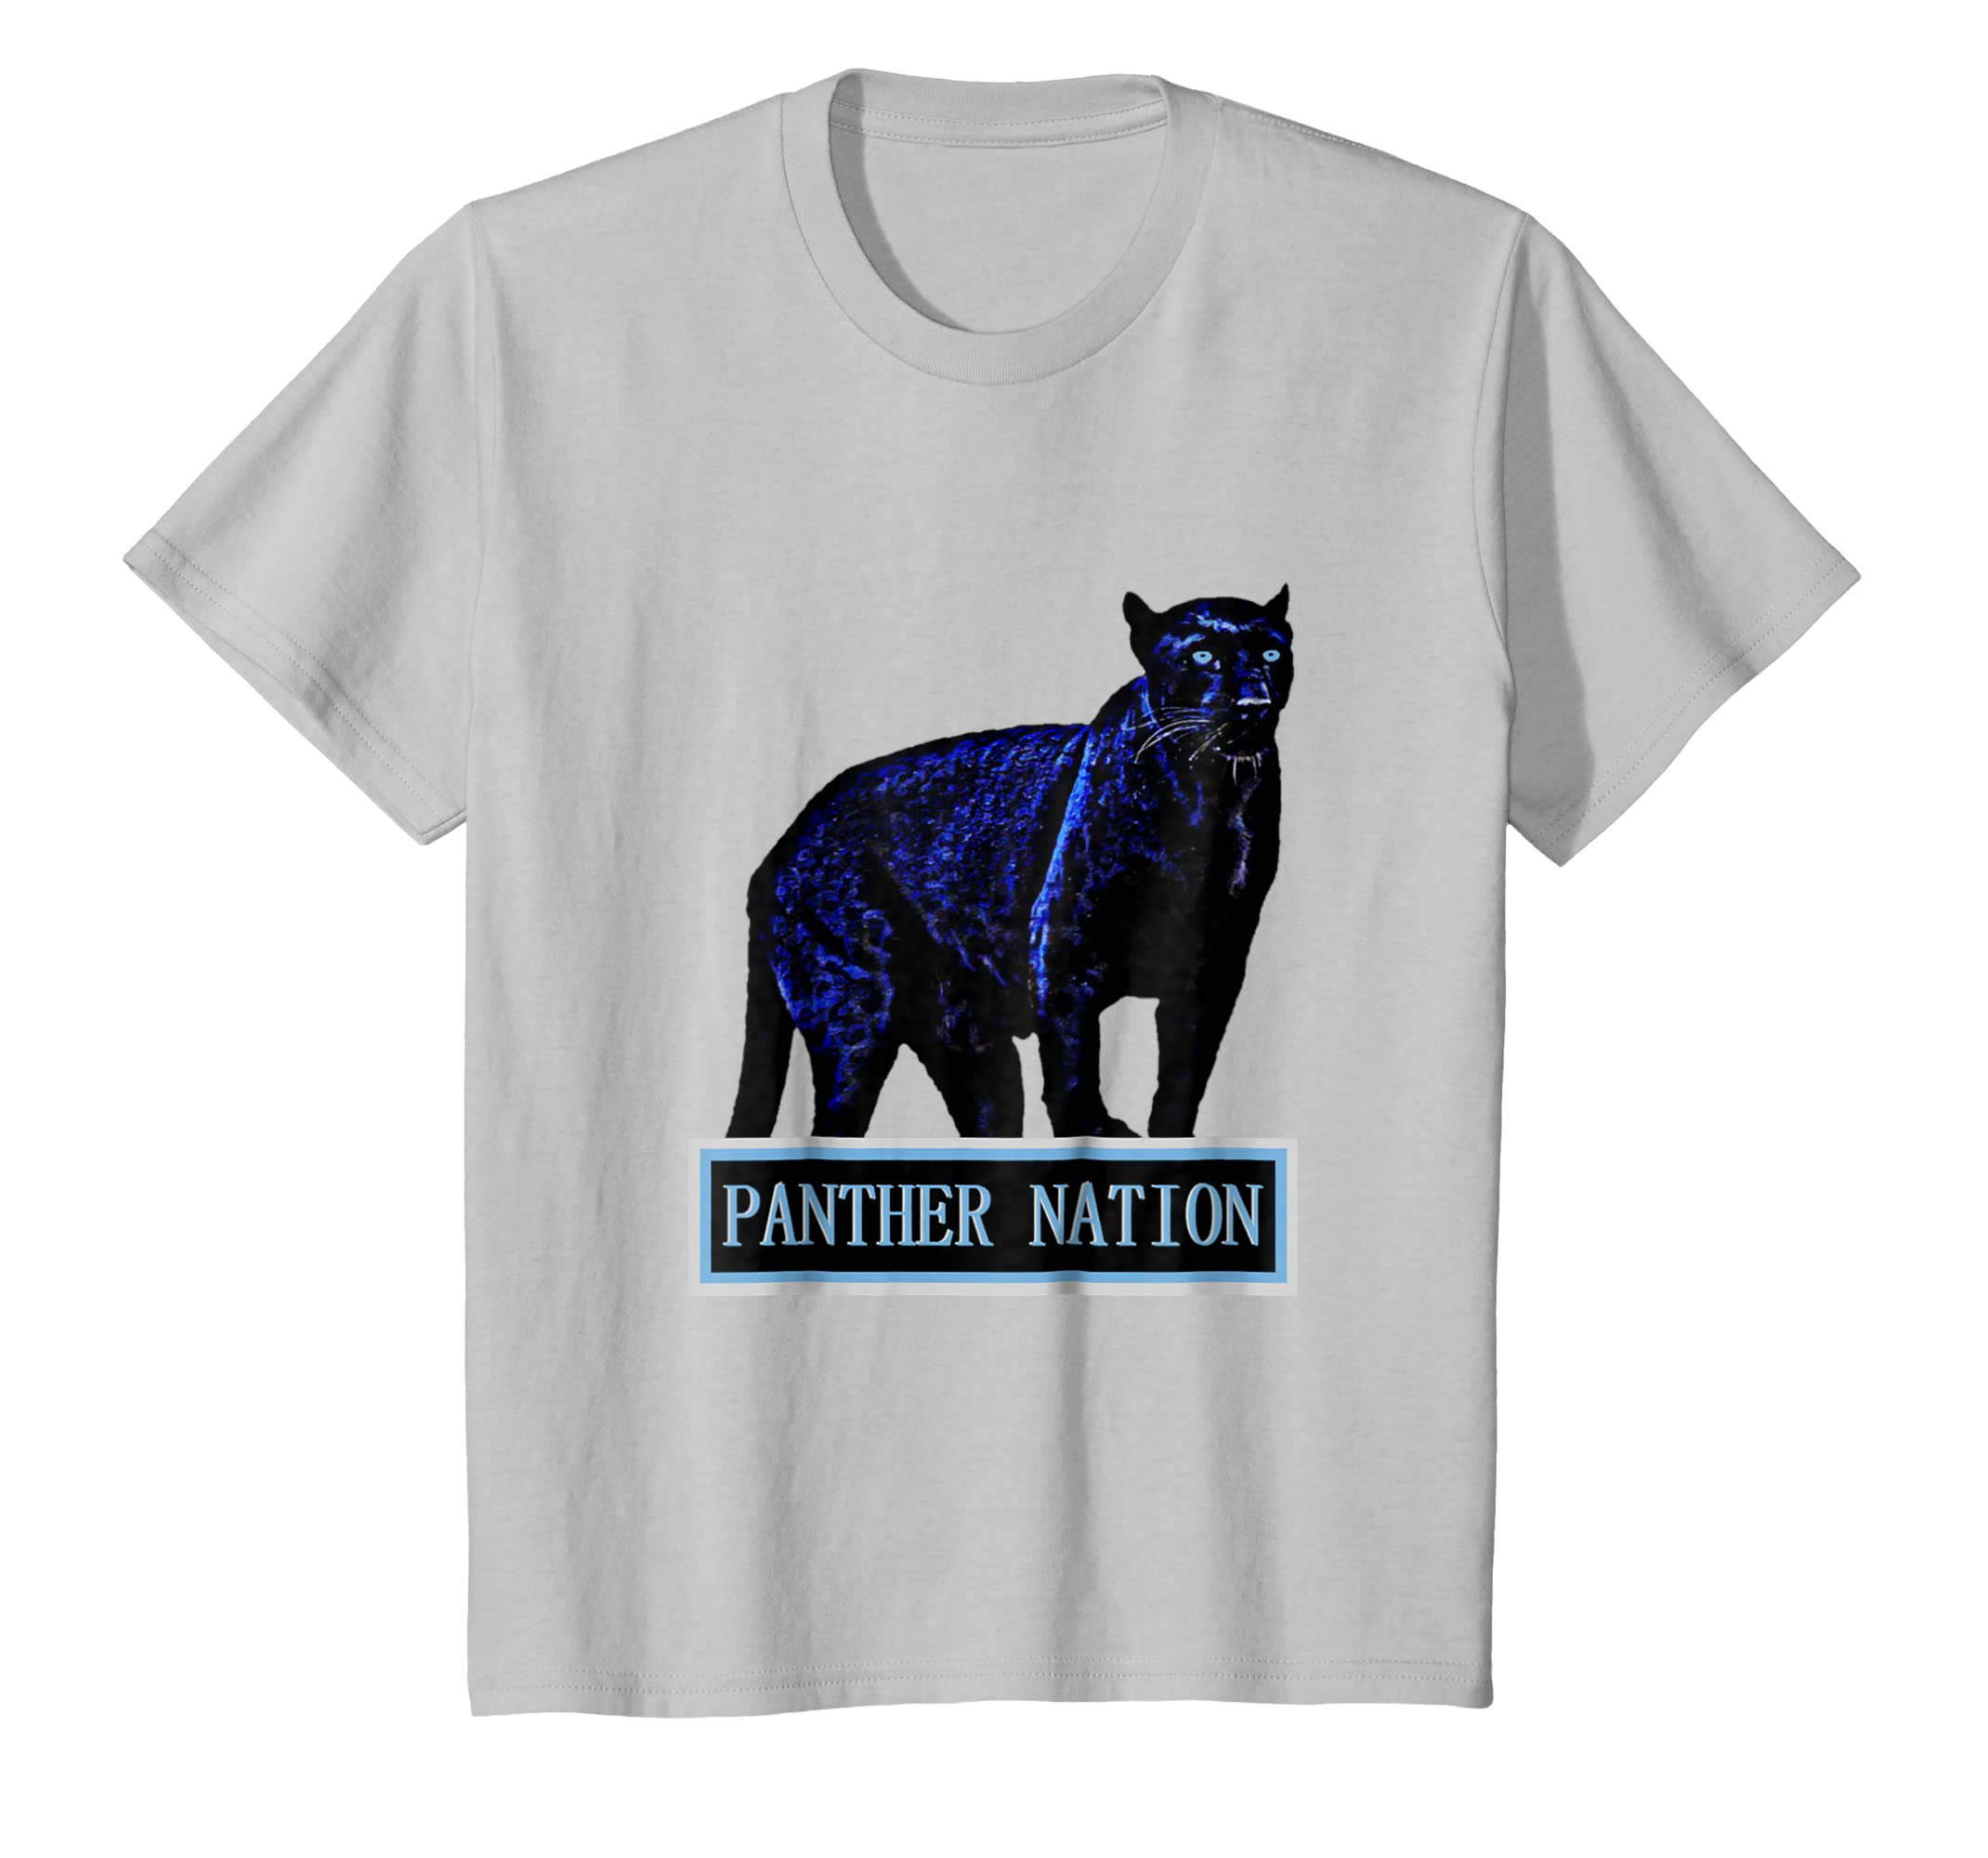 d99eade7 Amazon.com: Keep Pounding Shirt Panthers Nation Mens Women Kids ...